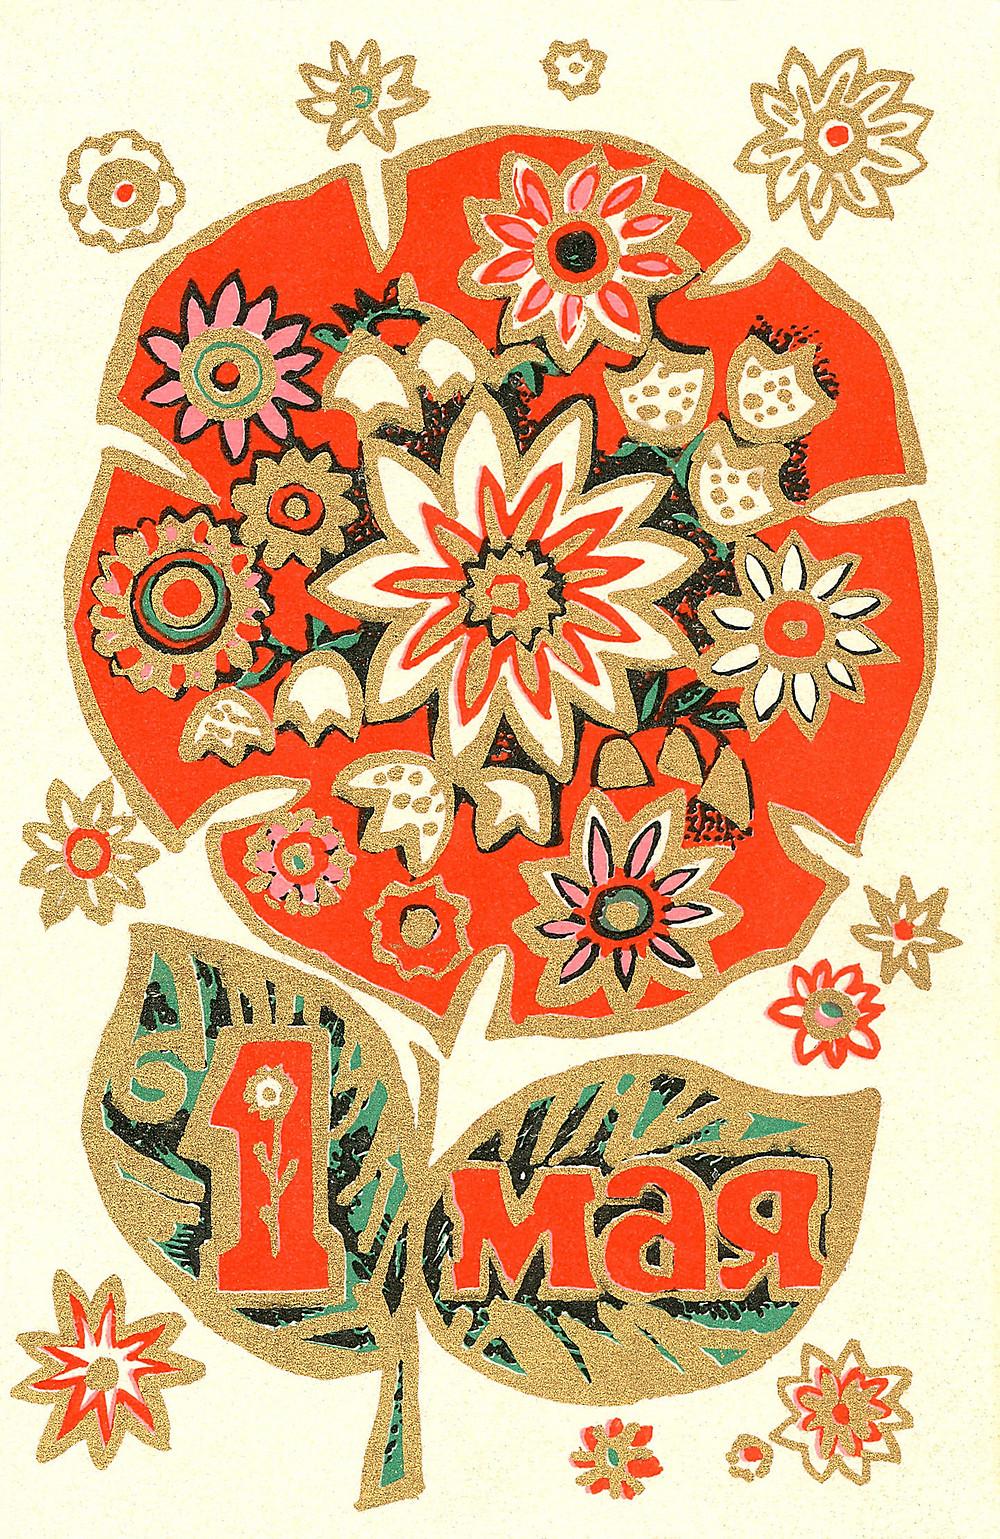 1967 Soviet propaganda postcard Photo by totallymystified on Flickr